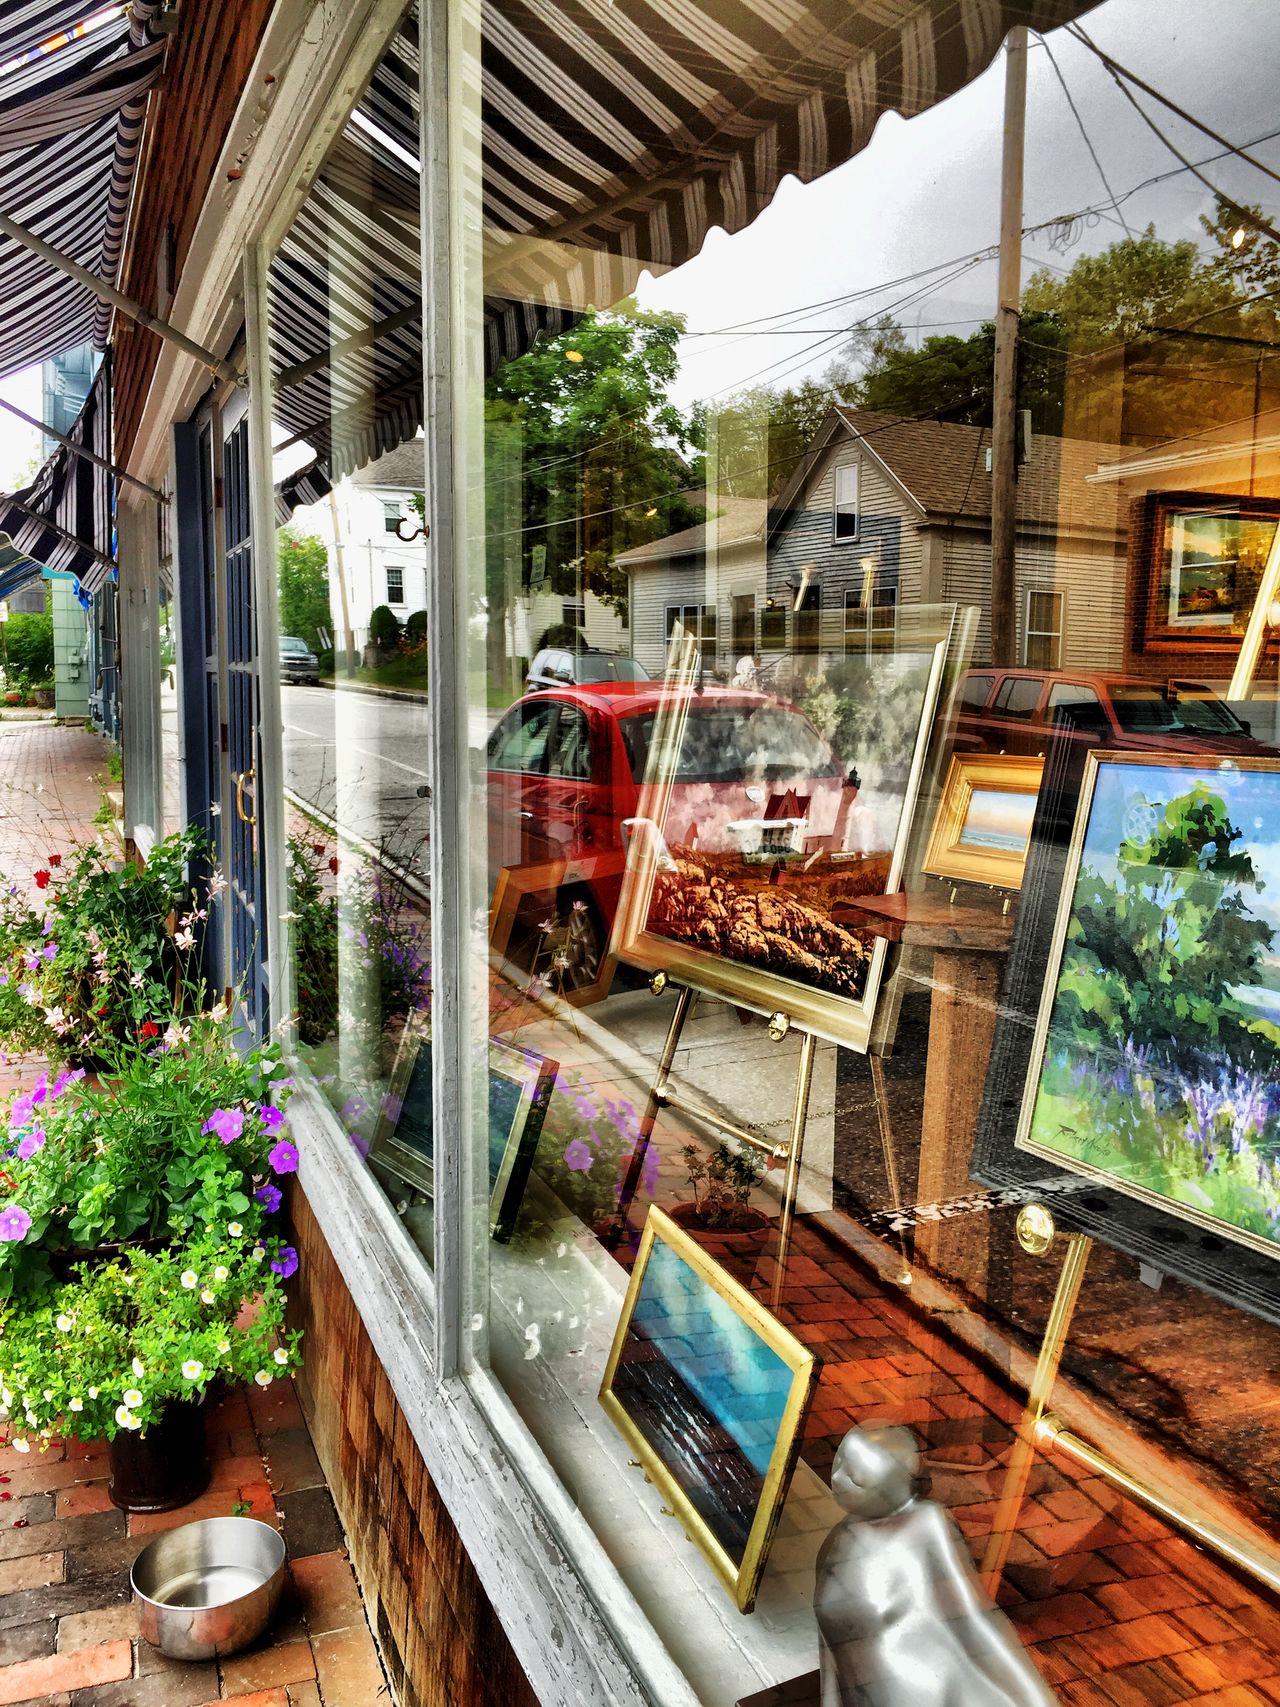 Reflection Window Art Gallery Downtown Taking Photos Maine Carol Sharkey Photography